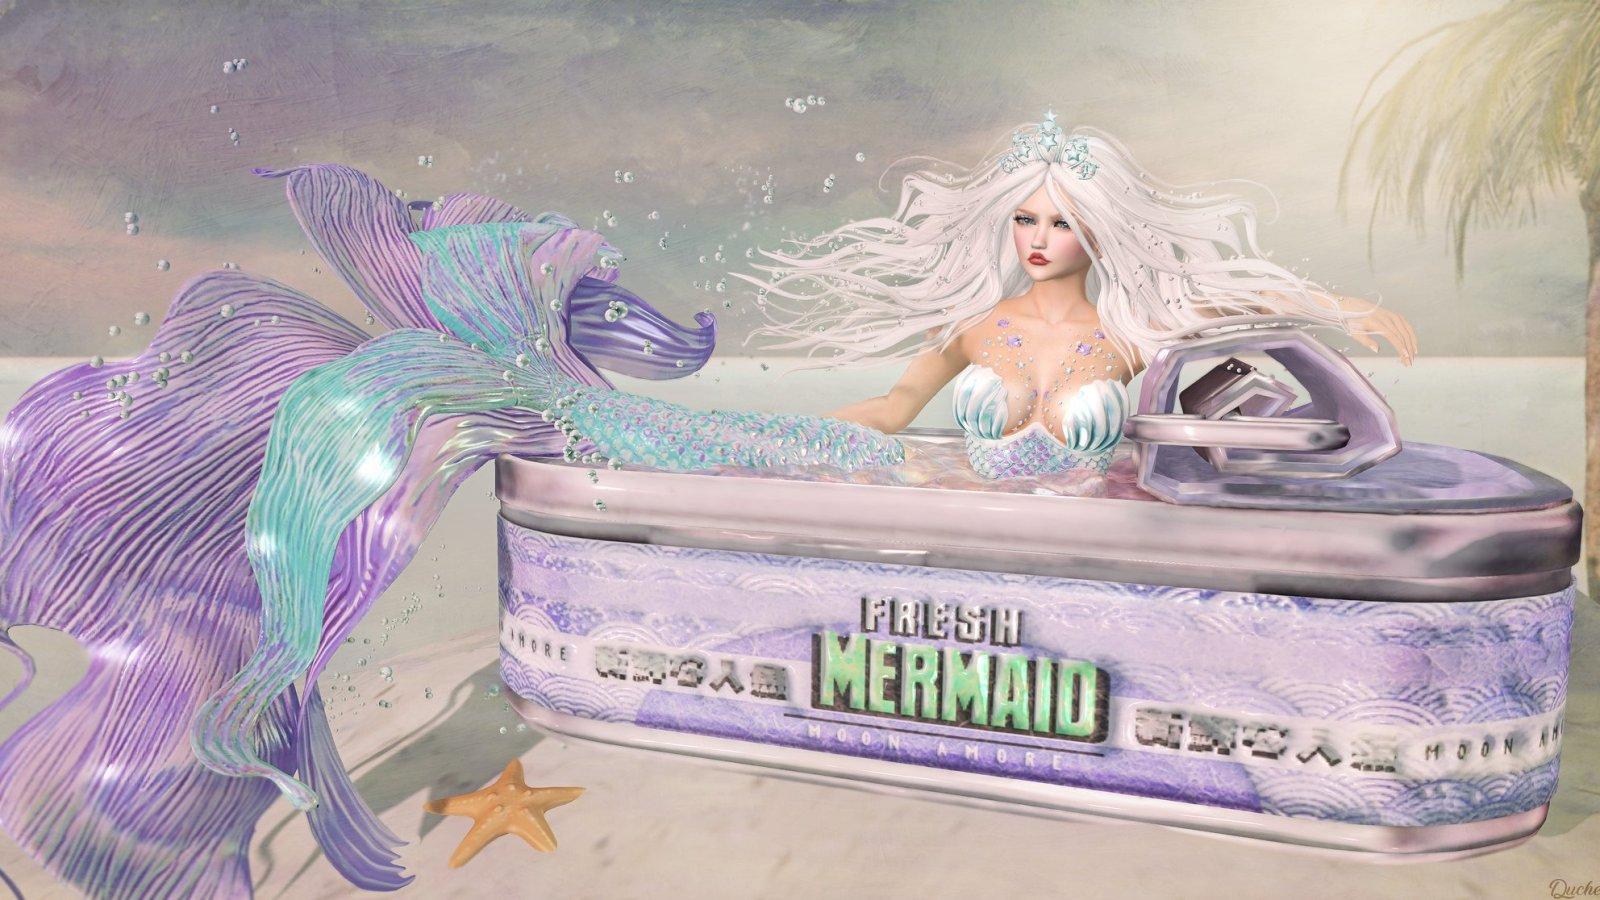 Fresh Mermaid